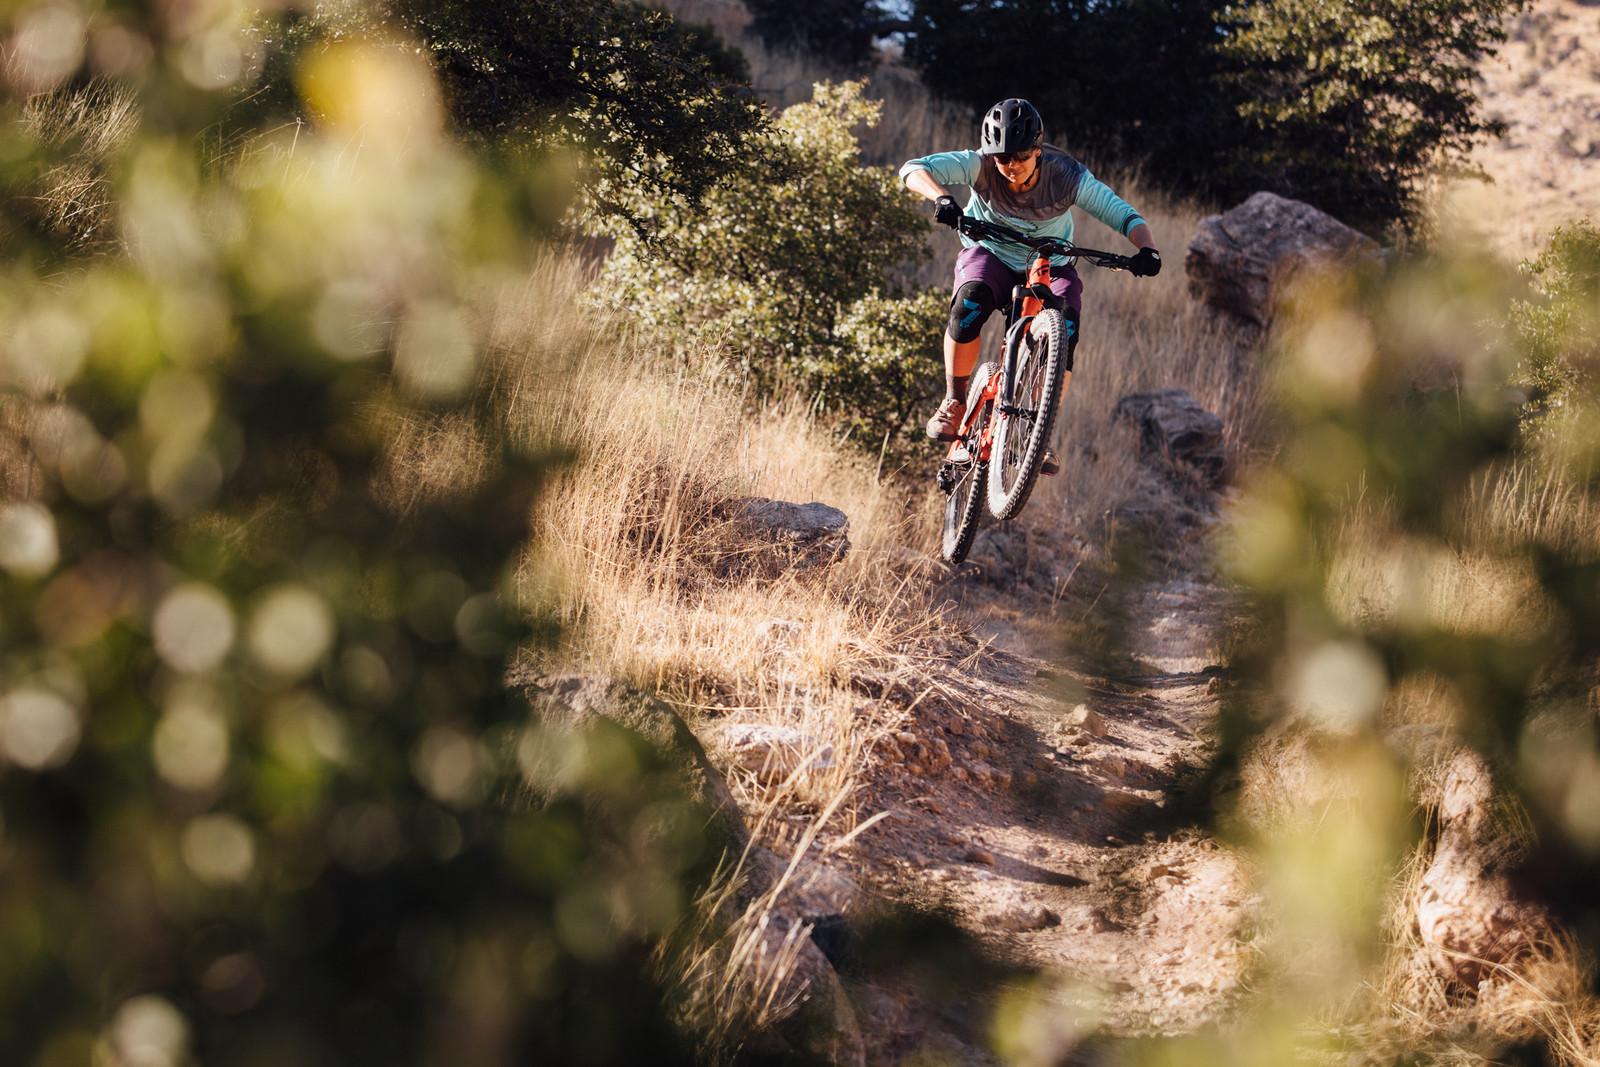 Little Bike Blasting - Just The Bangers - 2017 Vital MTB Test Sessions Photo Gallery - Mountain Biking Pictures - Vital MTB